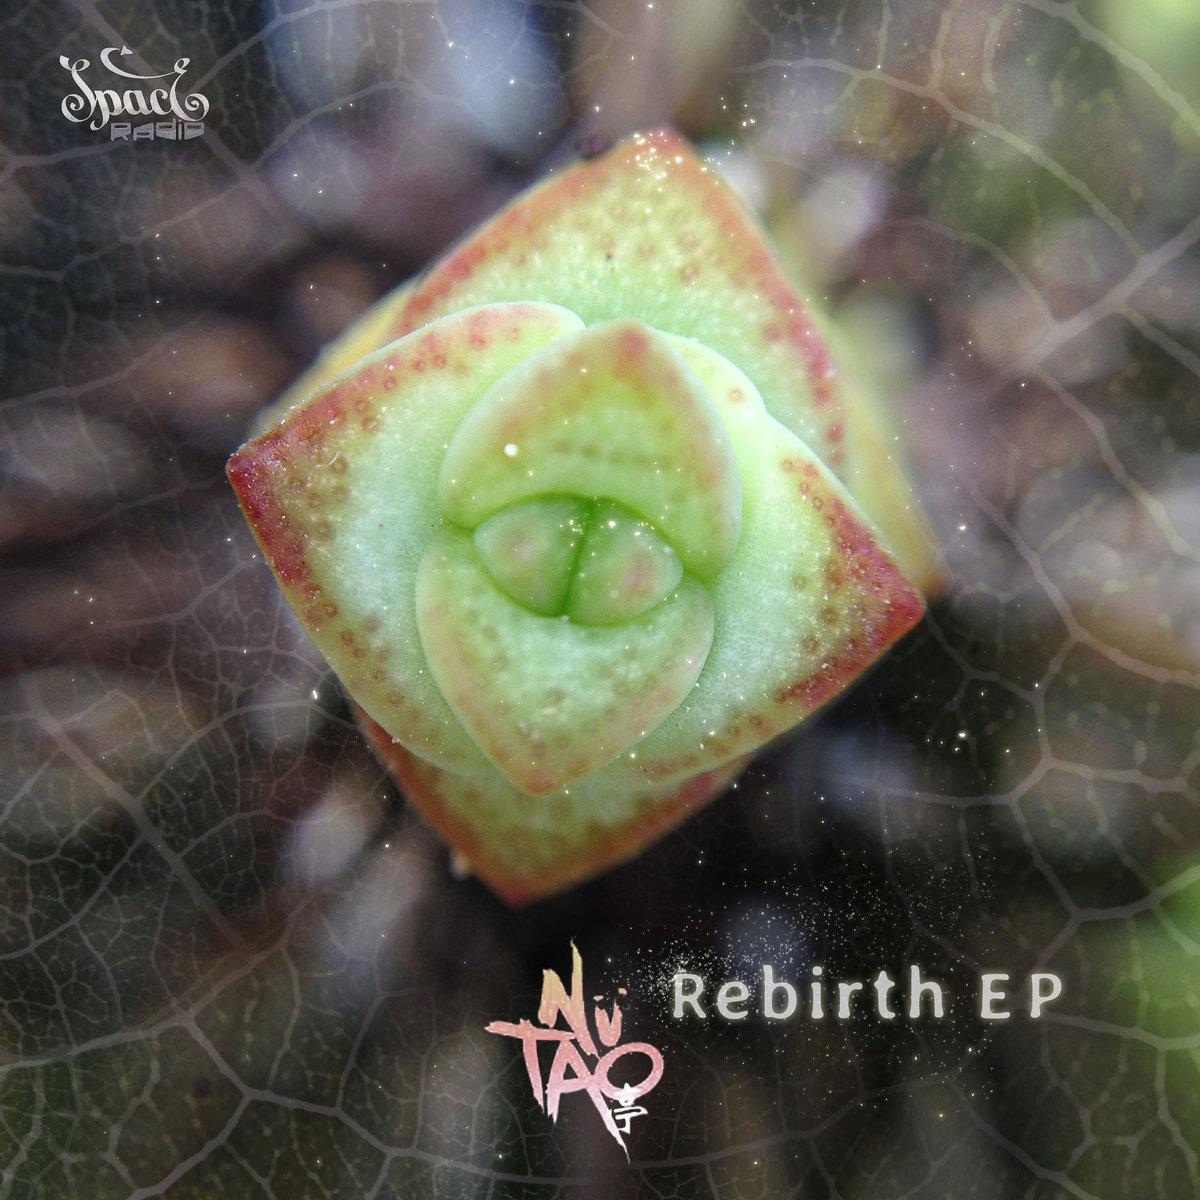 nü tao - Rebirth EP